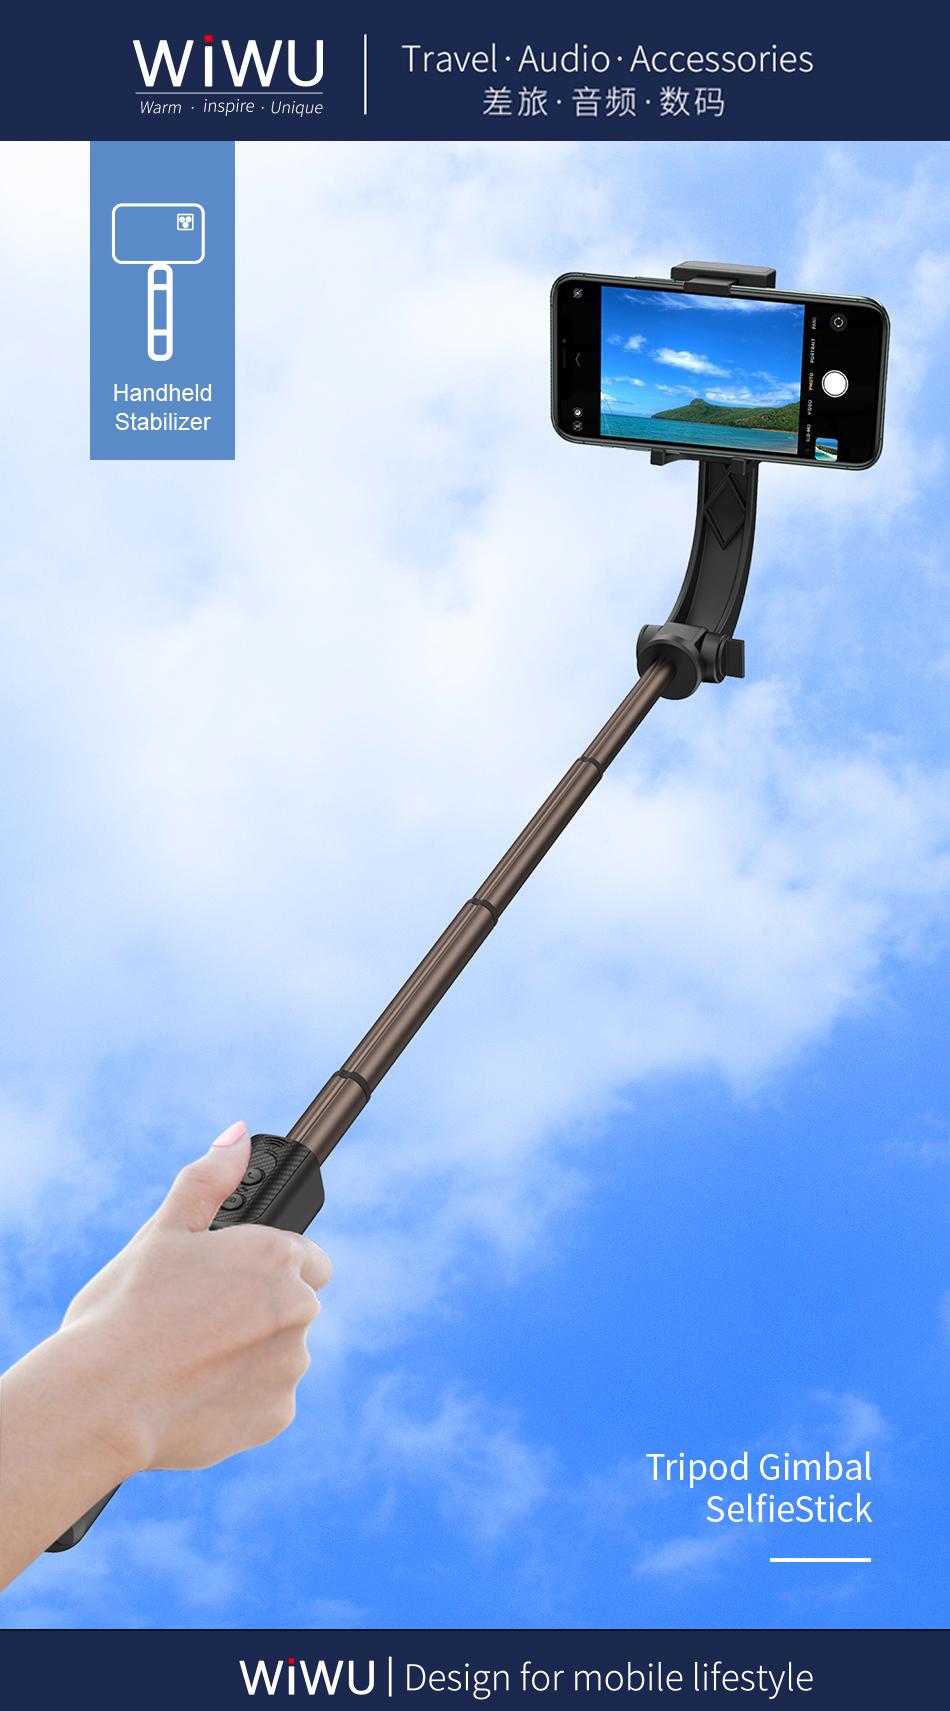 WIWU 手机自拍杆带蓝牙遥控 (https://www.wiwu.net.cn/) 手机支架 第4张